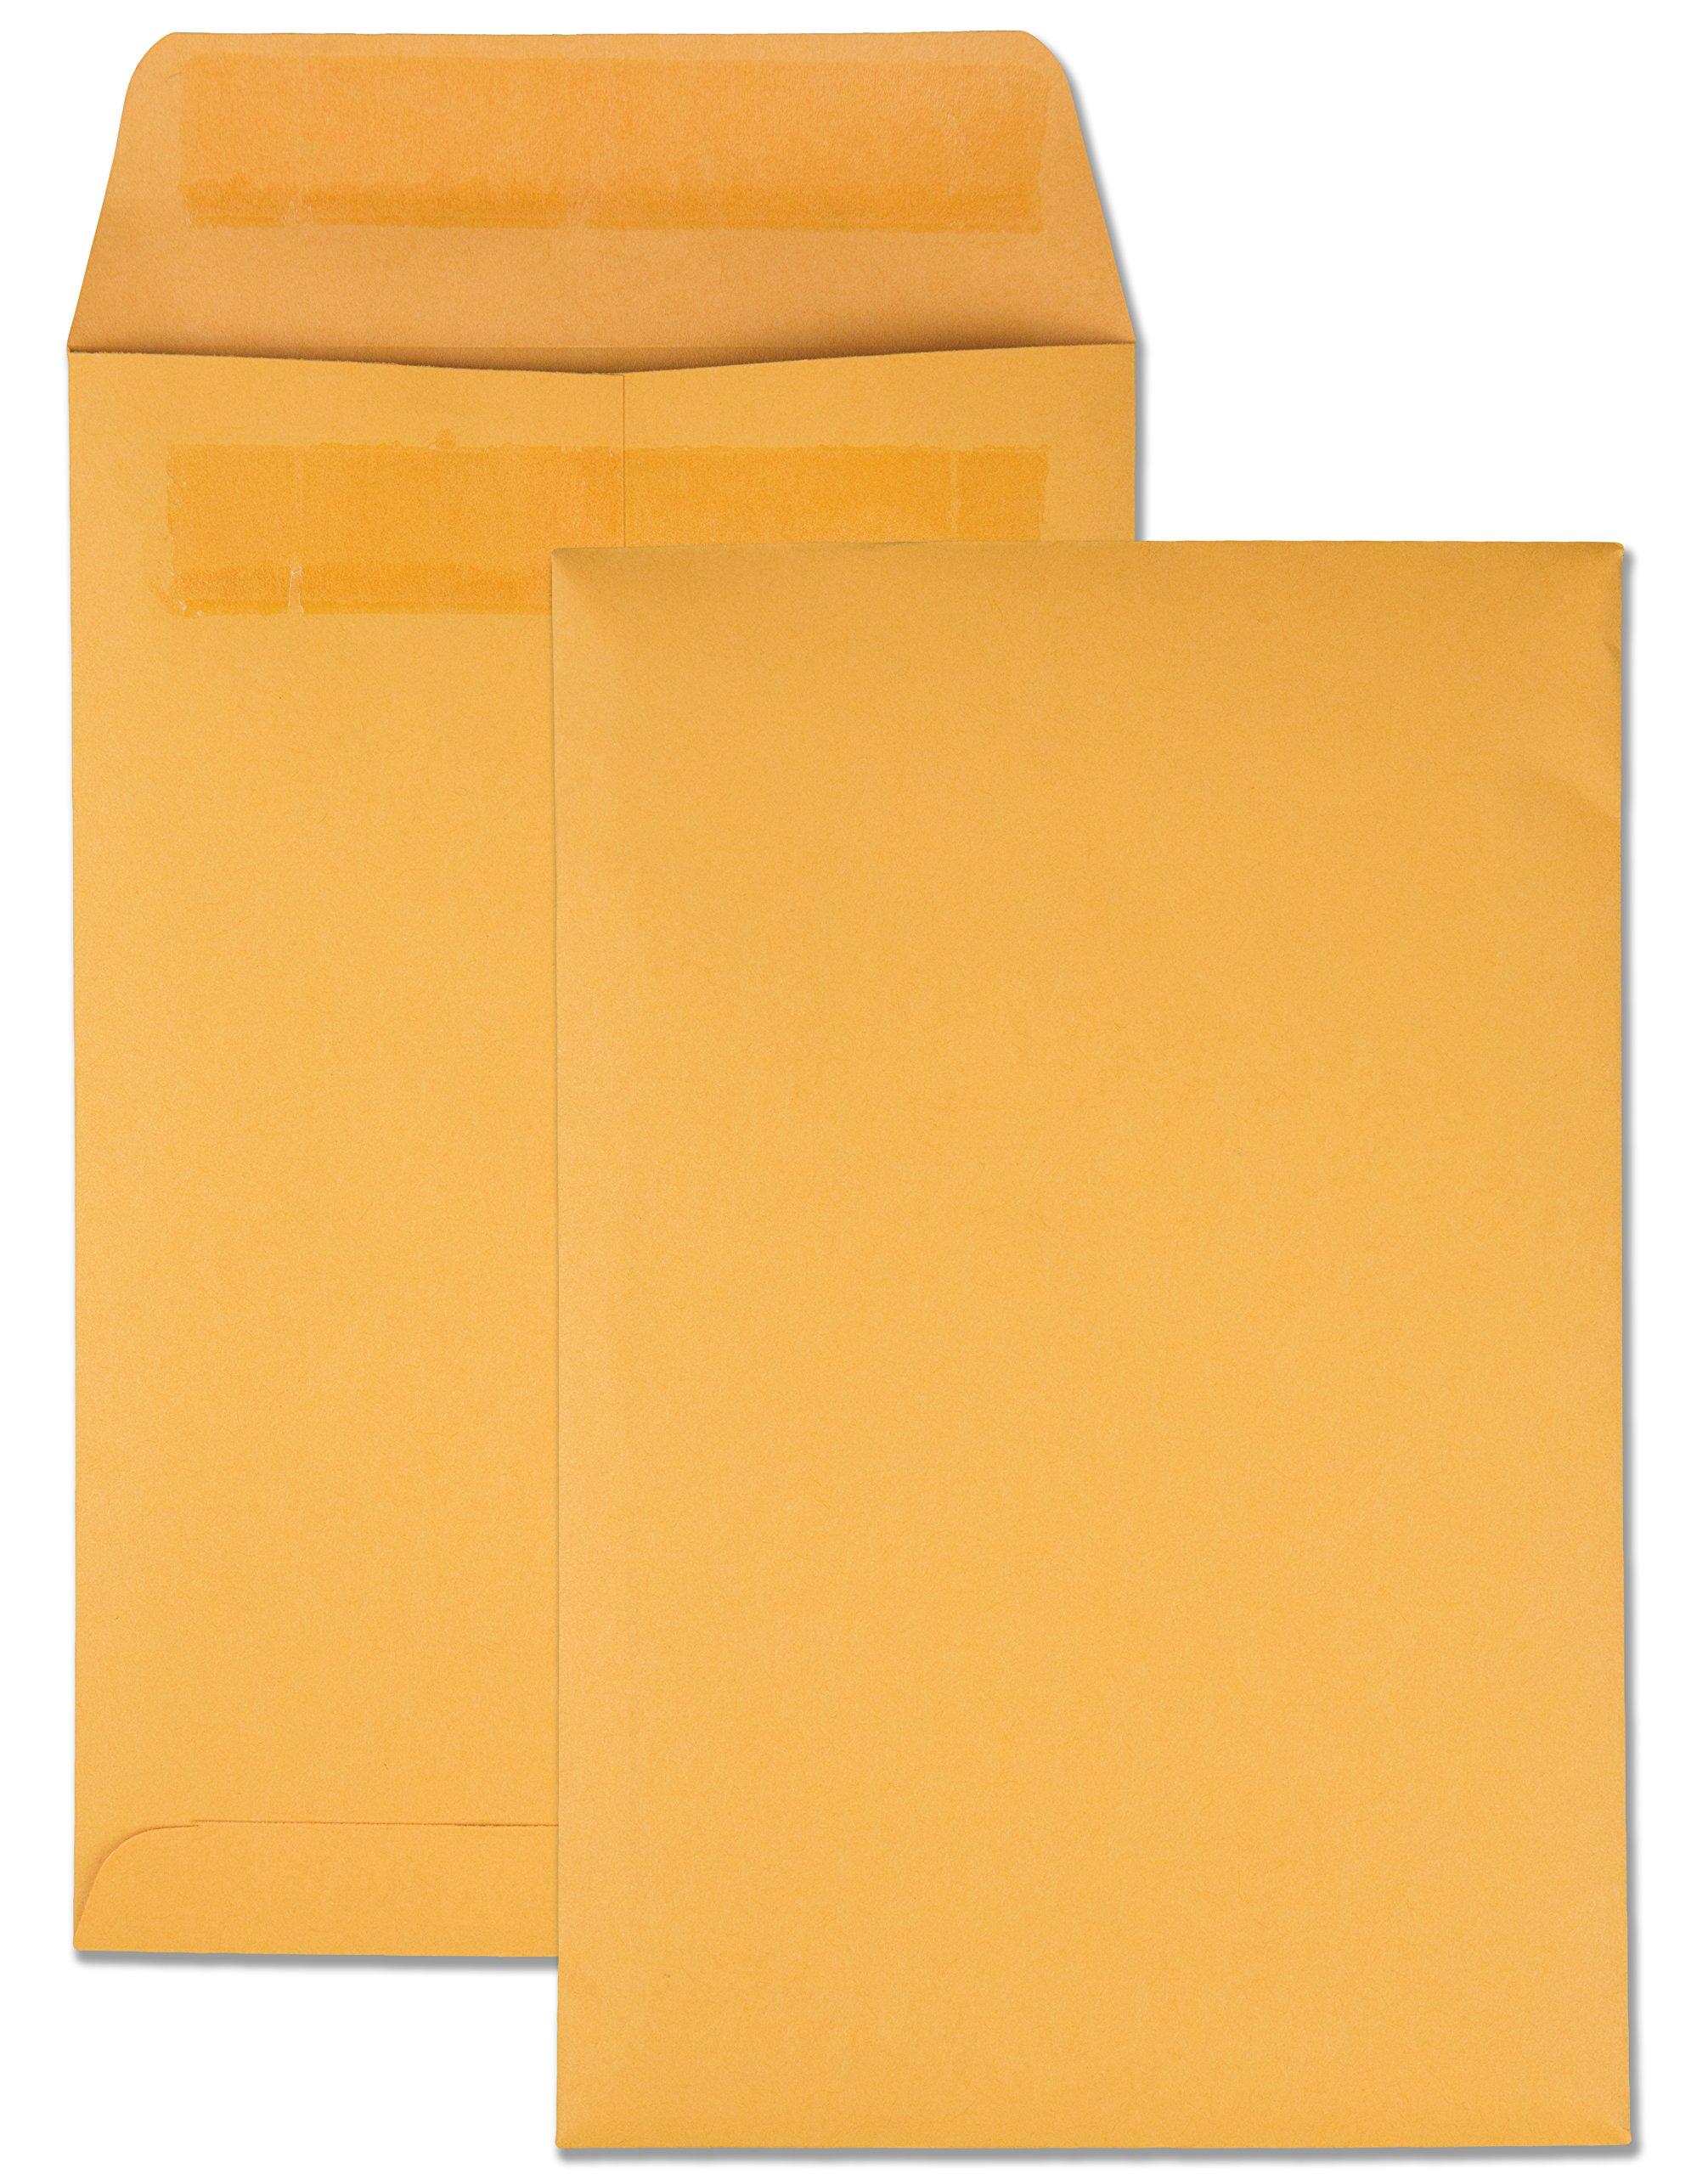 Quality Park Large Format/Catalog Envelopes, Redi-Seal, 6.5 x 9.5, Box of 250 (QUA43362)